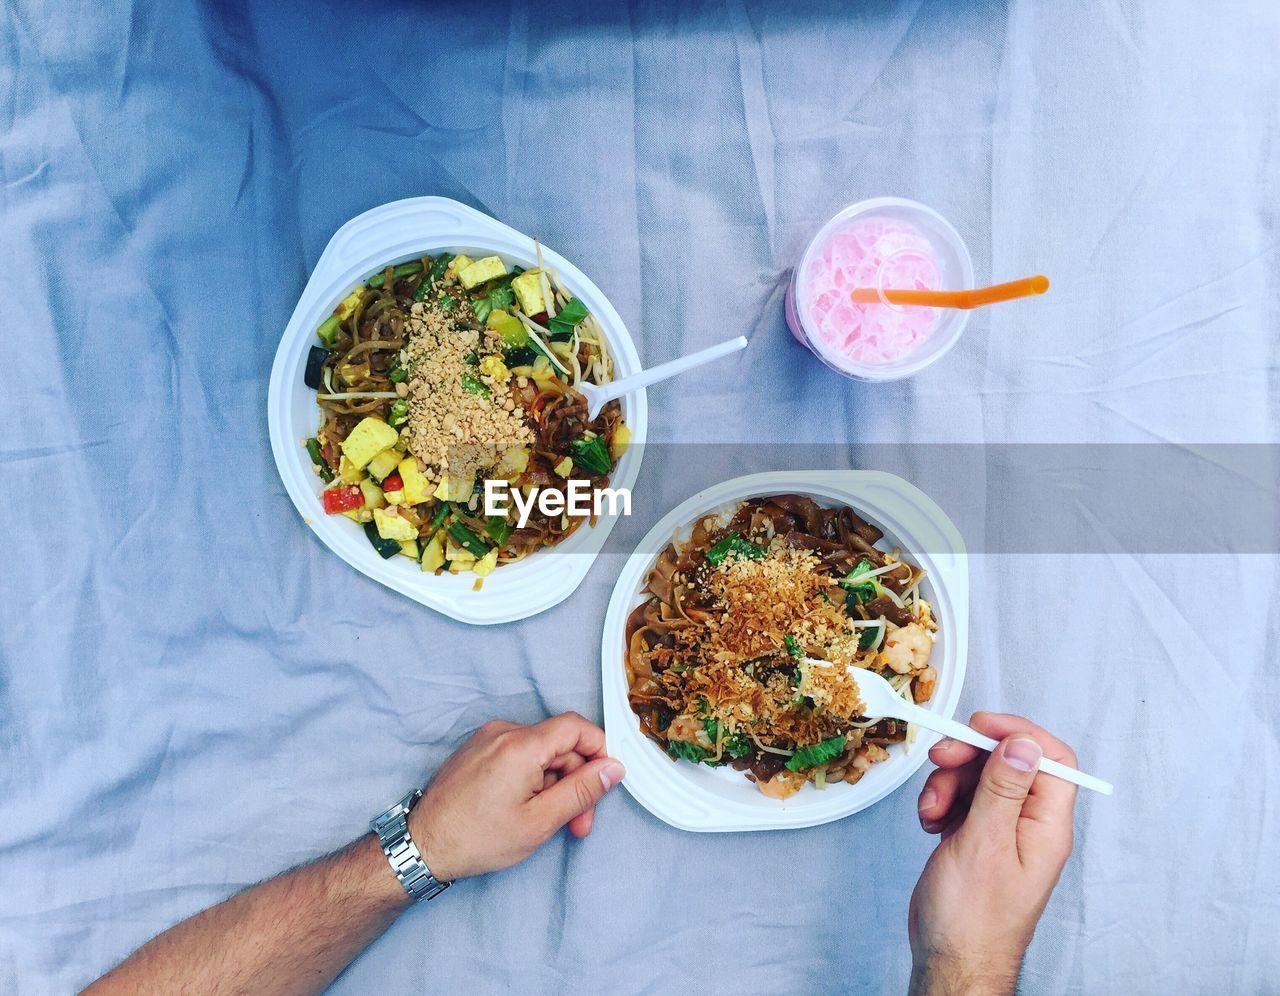 Cropped image of man eating food